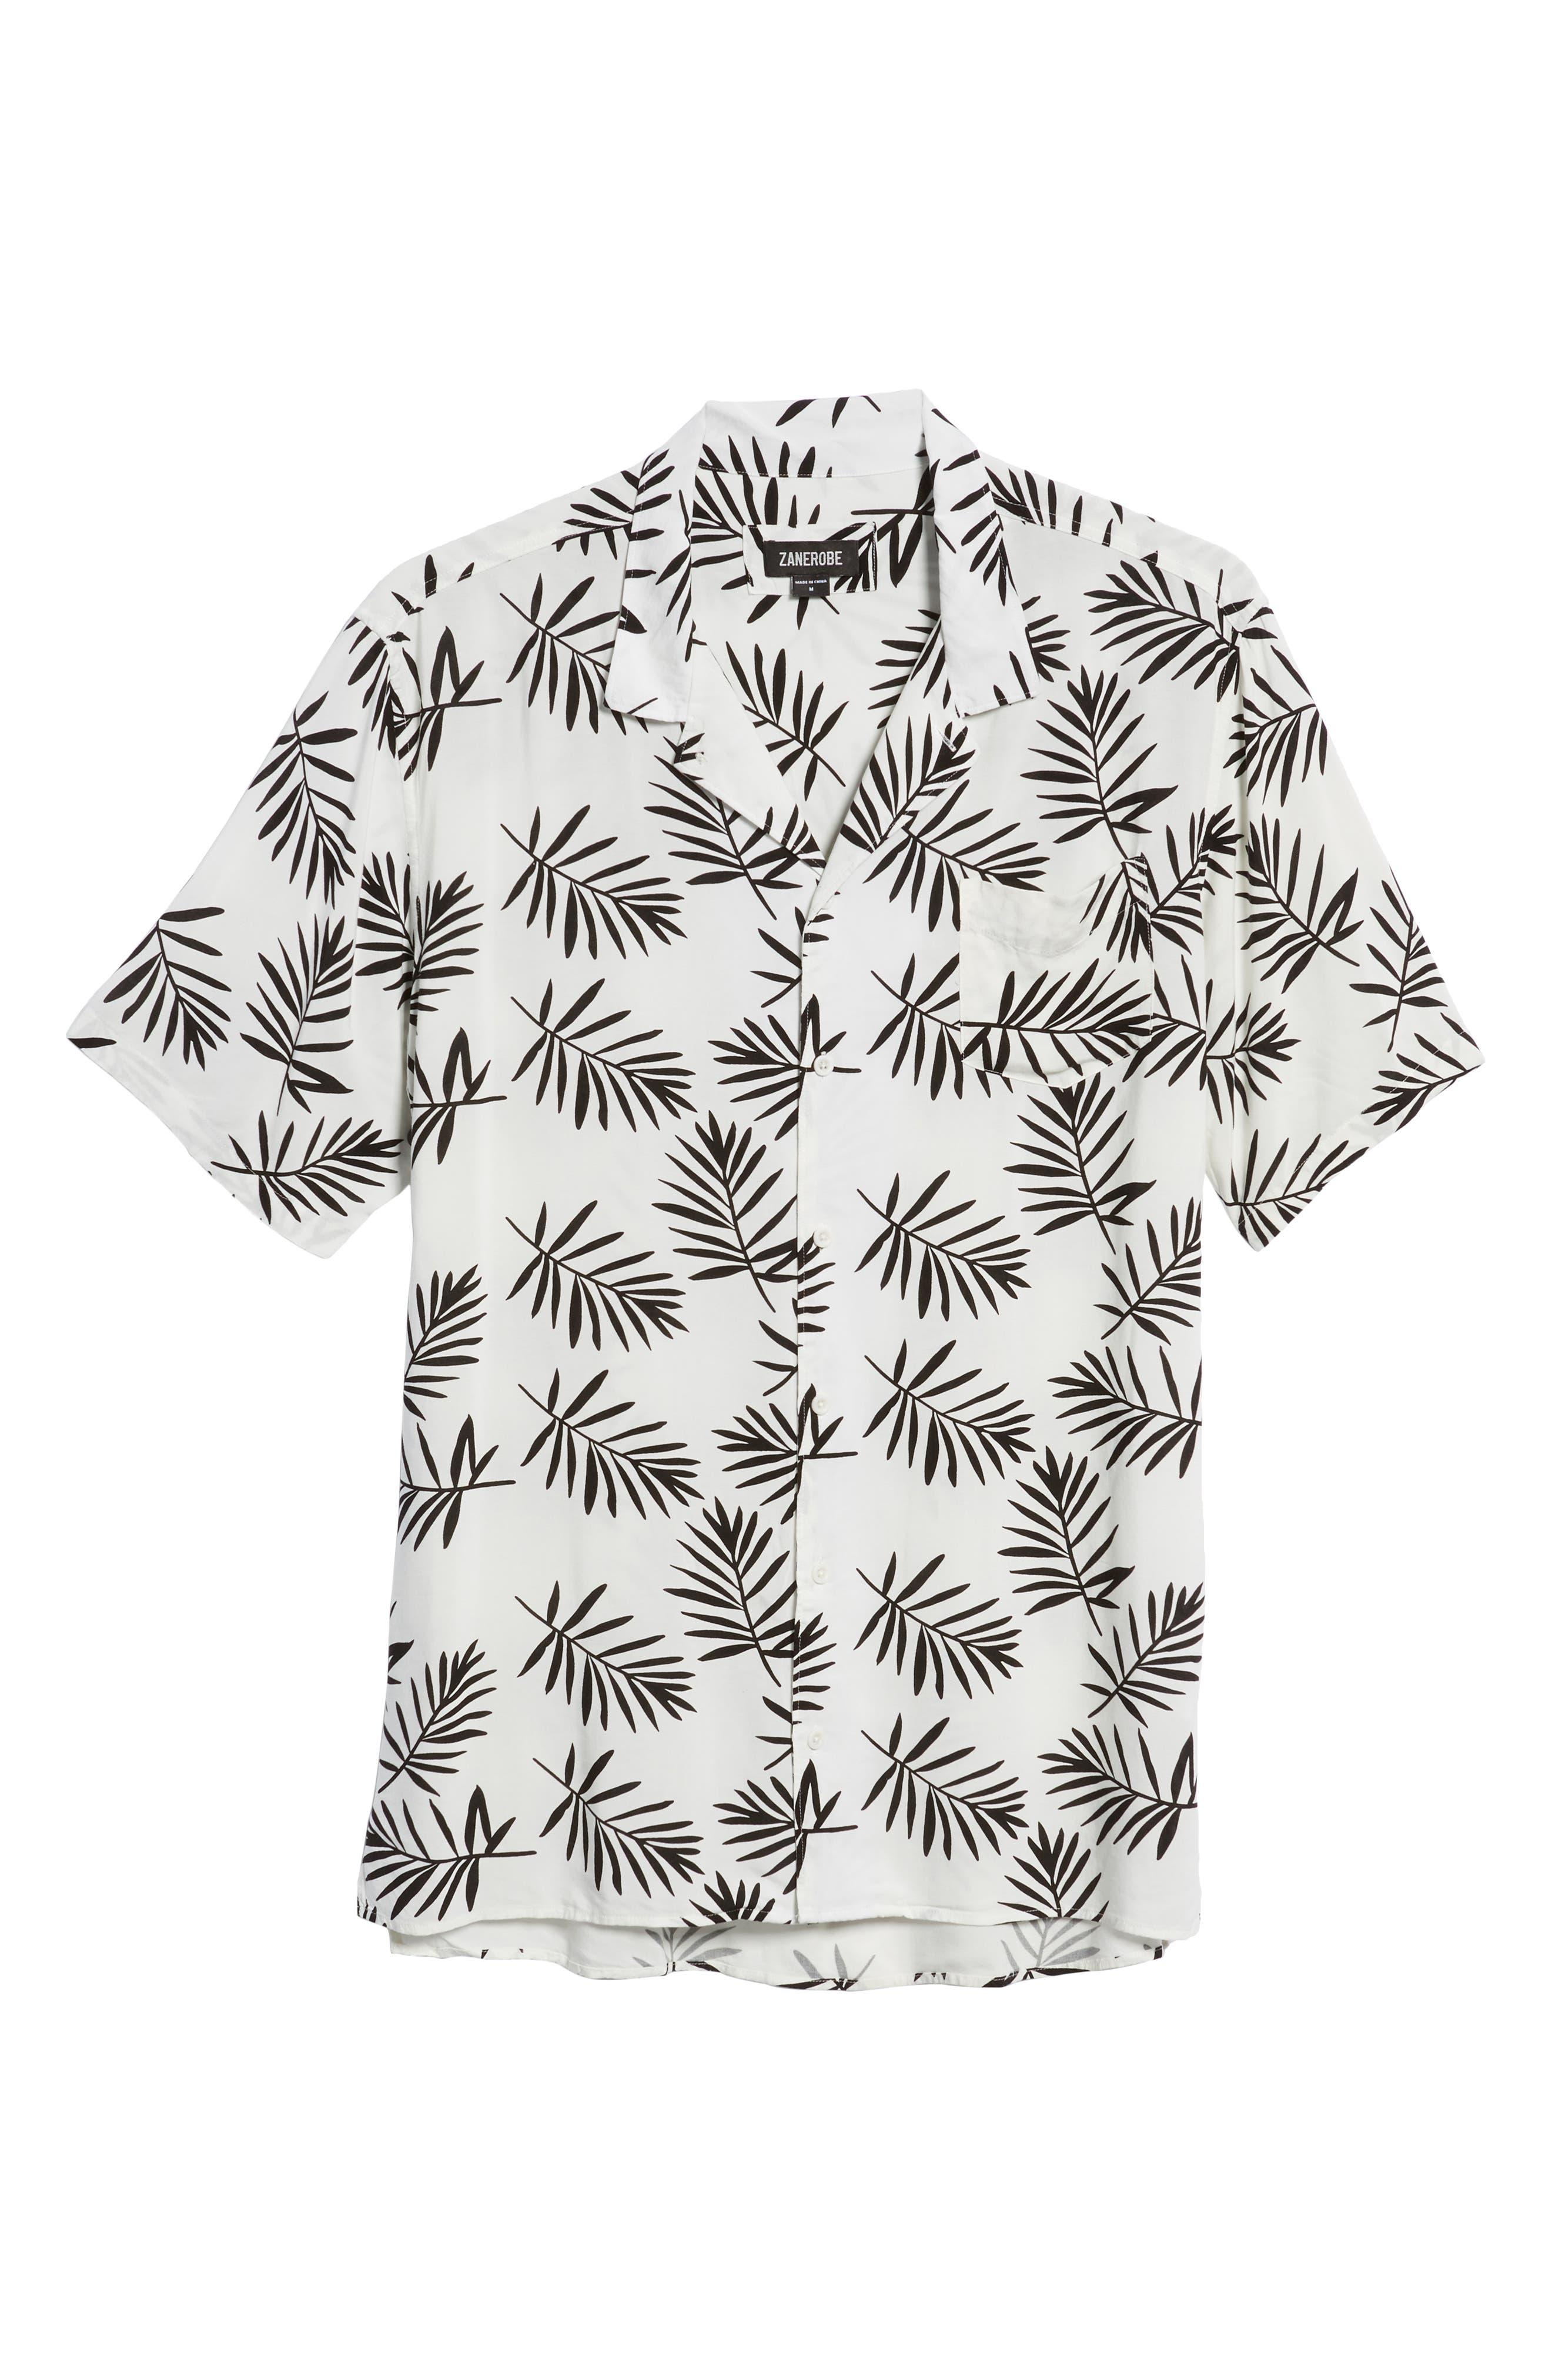 ZANEROBE,                             Fern Camp Shirt,                             Alternate thumbnail 5, color,                             100